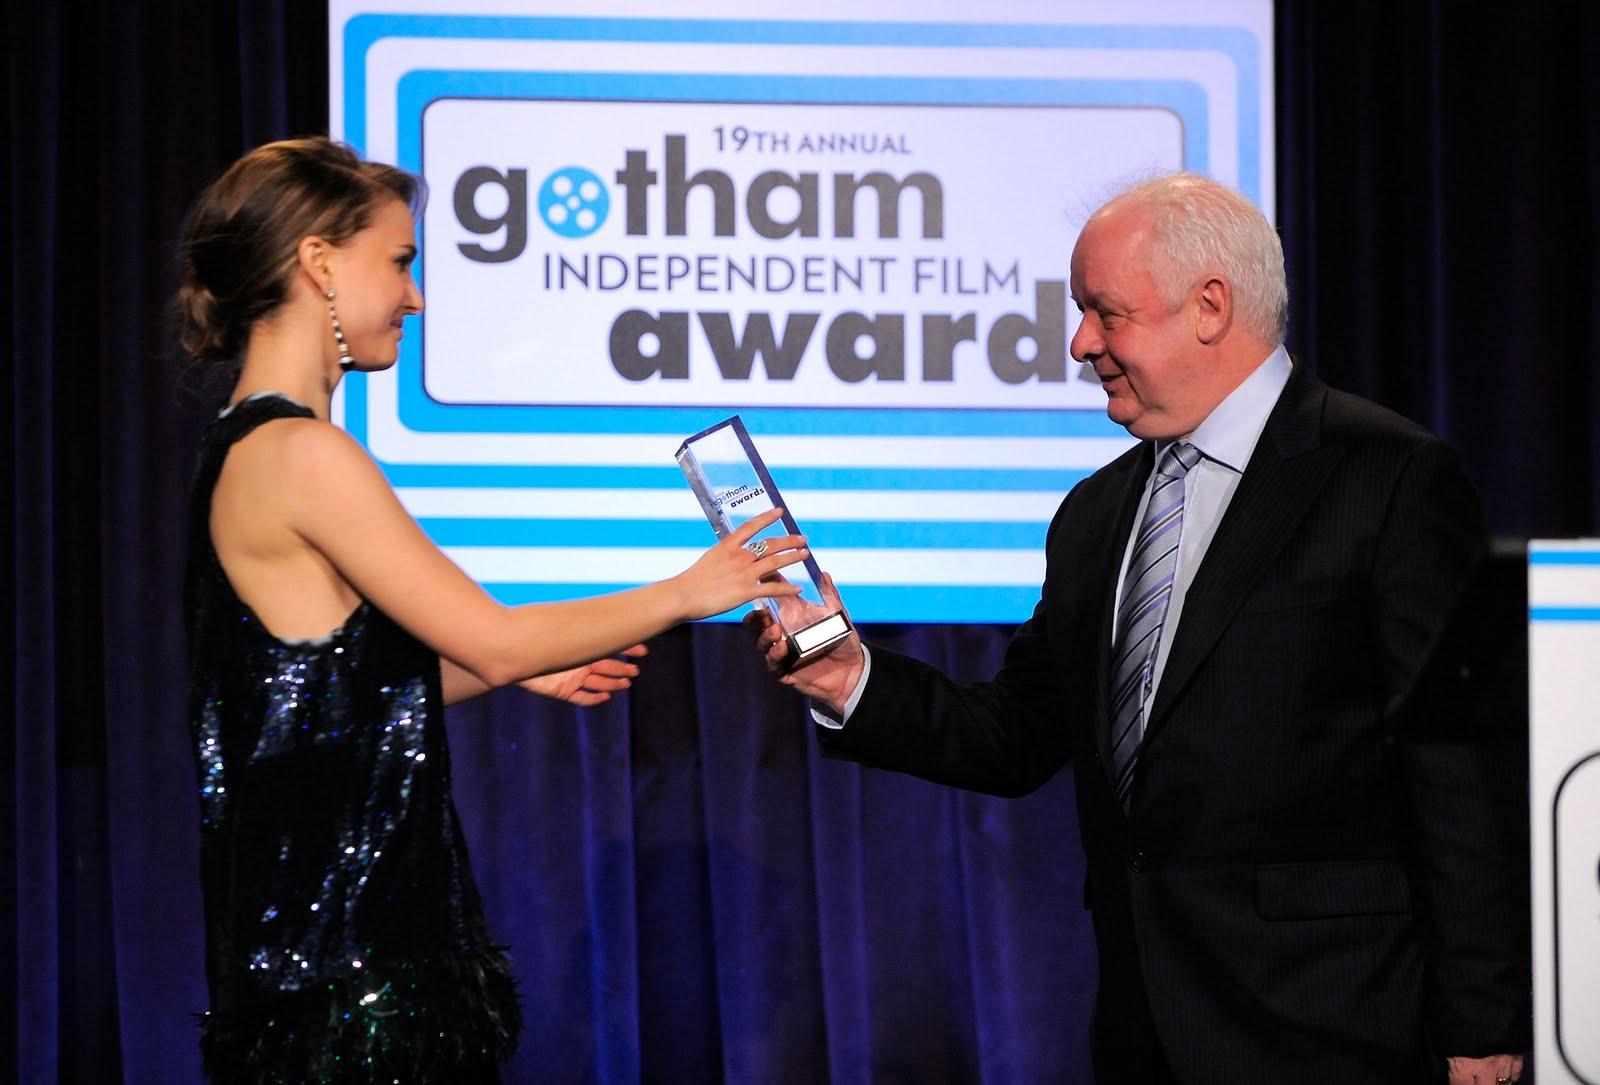 http://3.bp.blogspot.com/_R5WS6_kmmTI/SxW5RtatEGI/AAAAAAAAh-o/BTkDuwlYSpI/s1600/05368_Preppie_-_Natalie_Portman_at_IFPs_19th_Annual_Gotham_Independent_Film_Awards_949_122_230lo.jpg